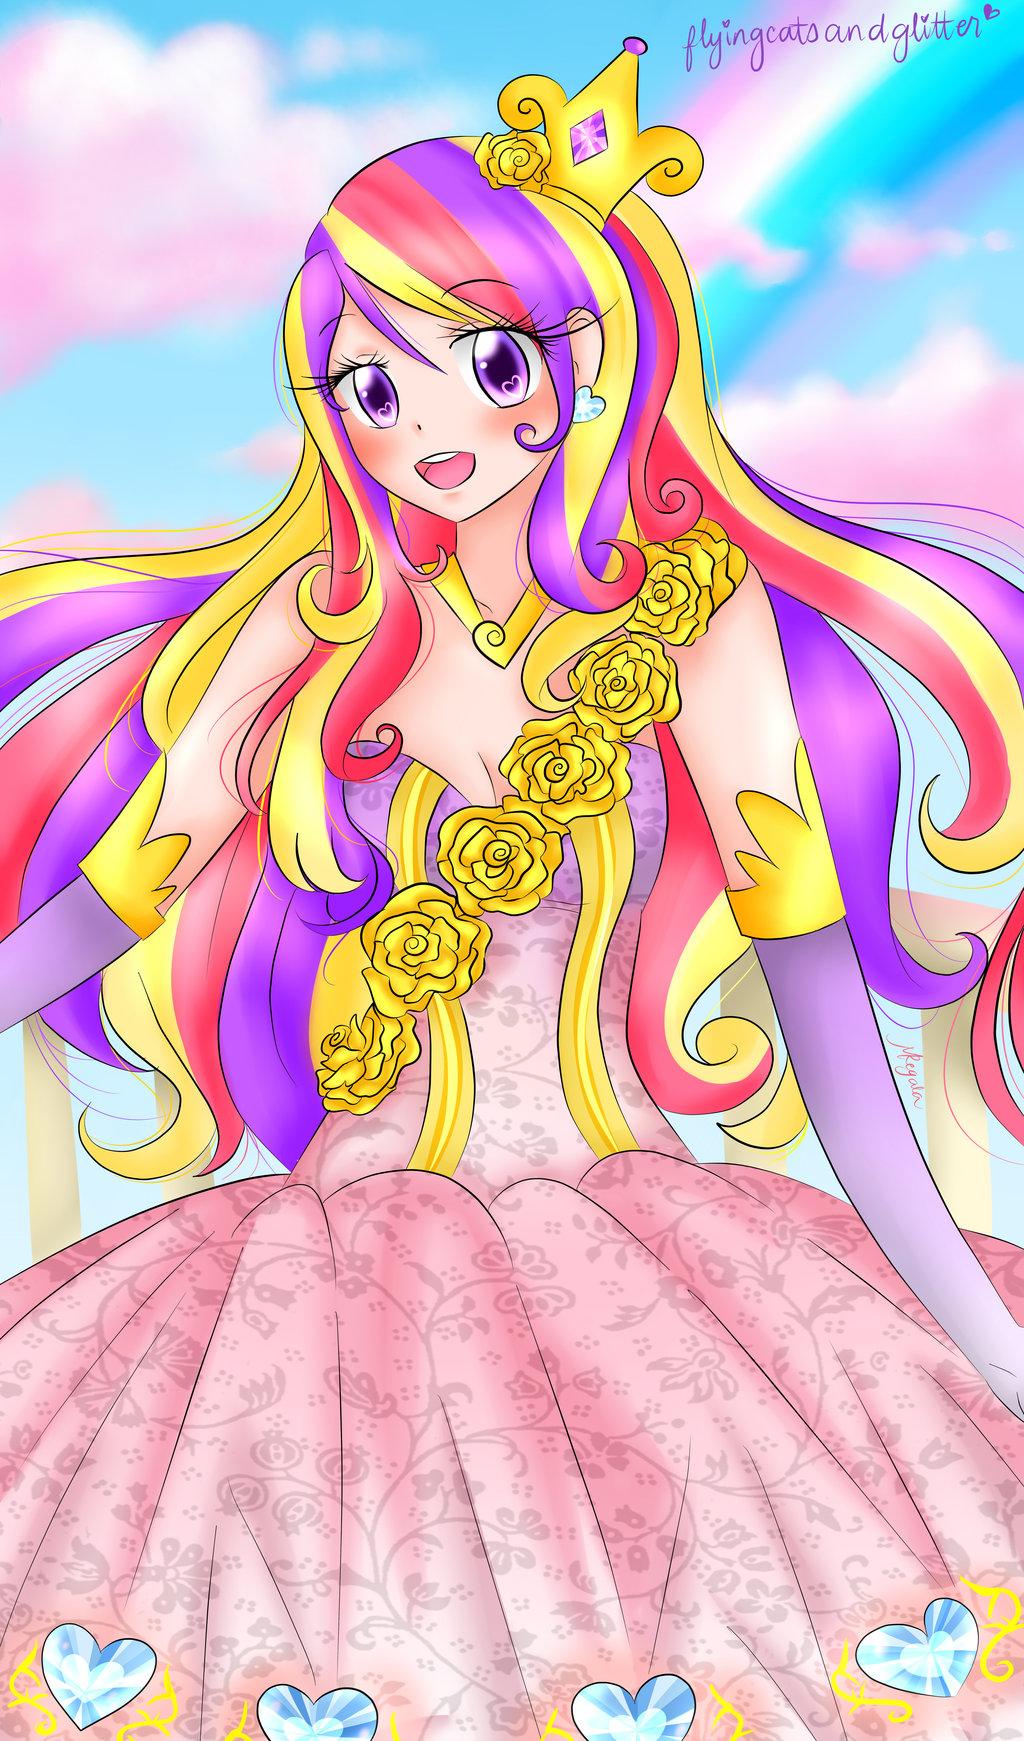 Princess Cadence - My Little Pony Friendship is Magic ... - photo#18